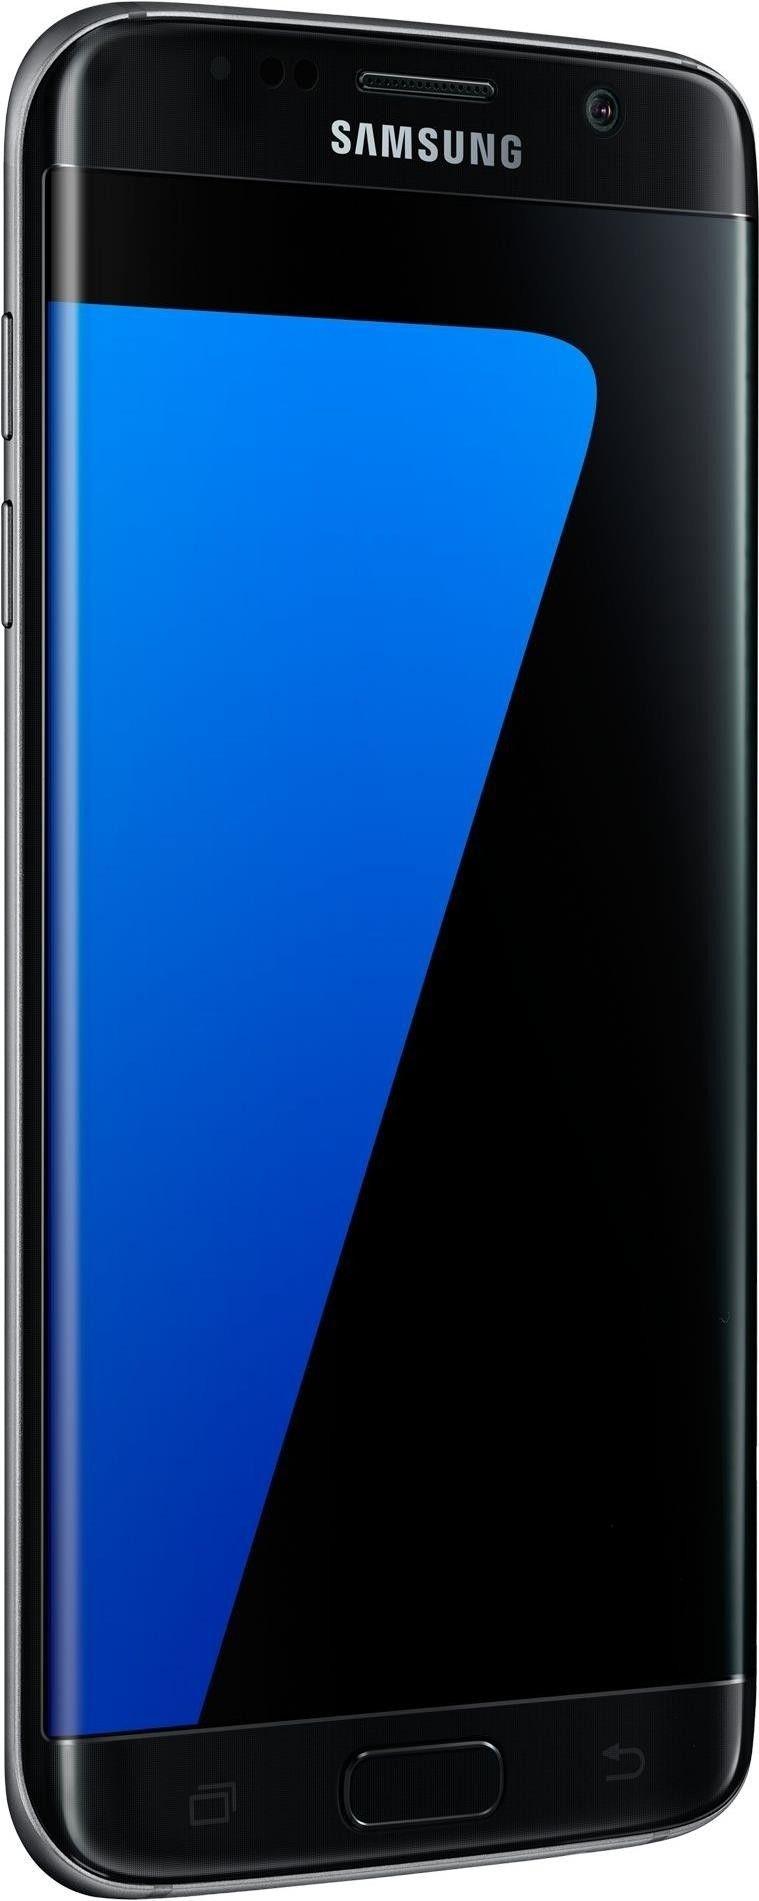 Мобильный телефон Samsung Galaxy S7 Edge Duos G935 (SM-G935FZKUSEK) Black - 3